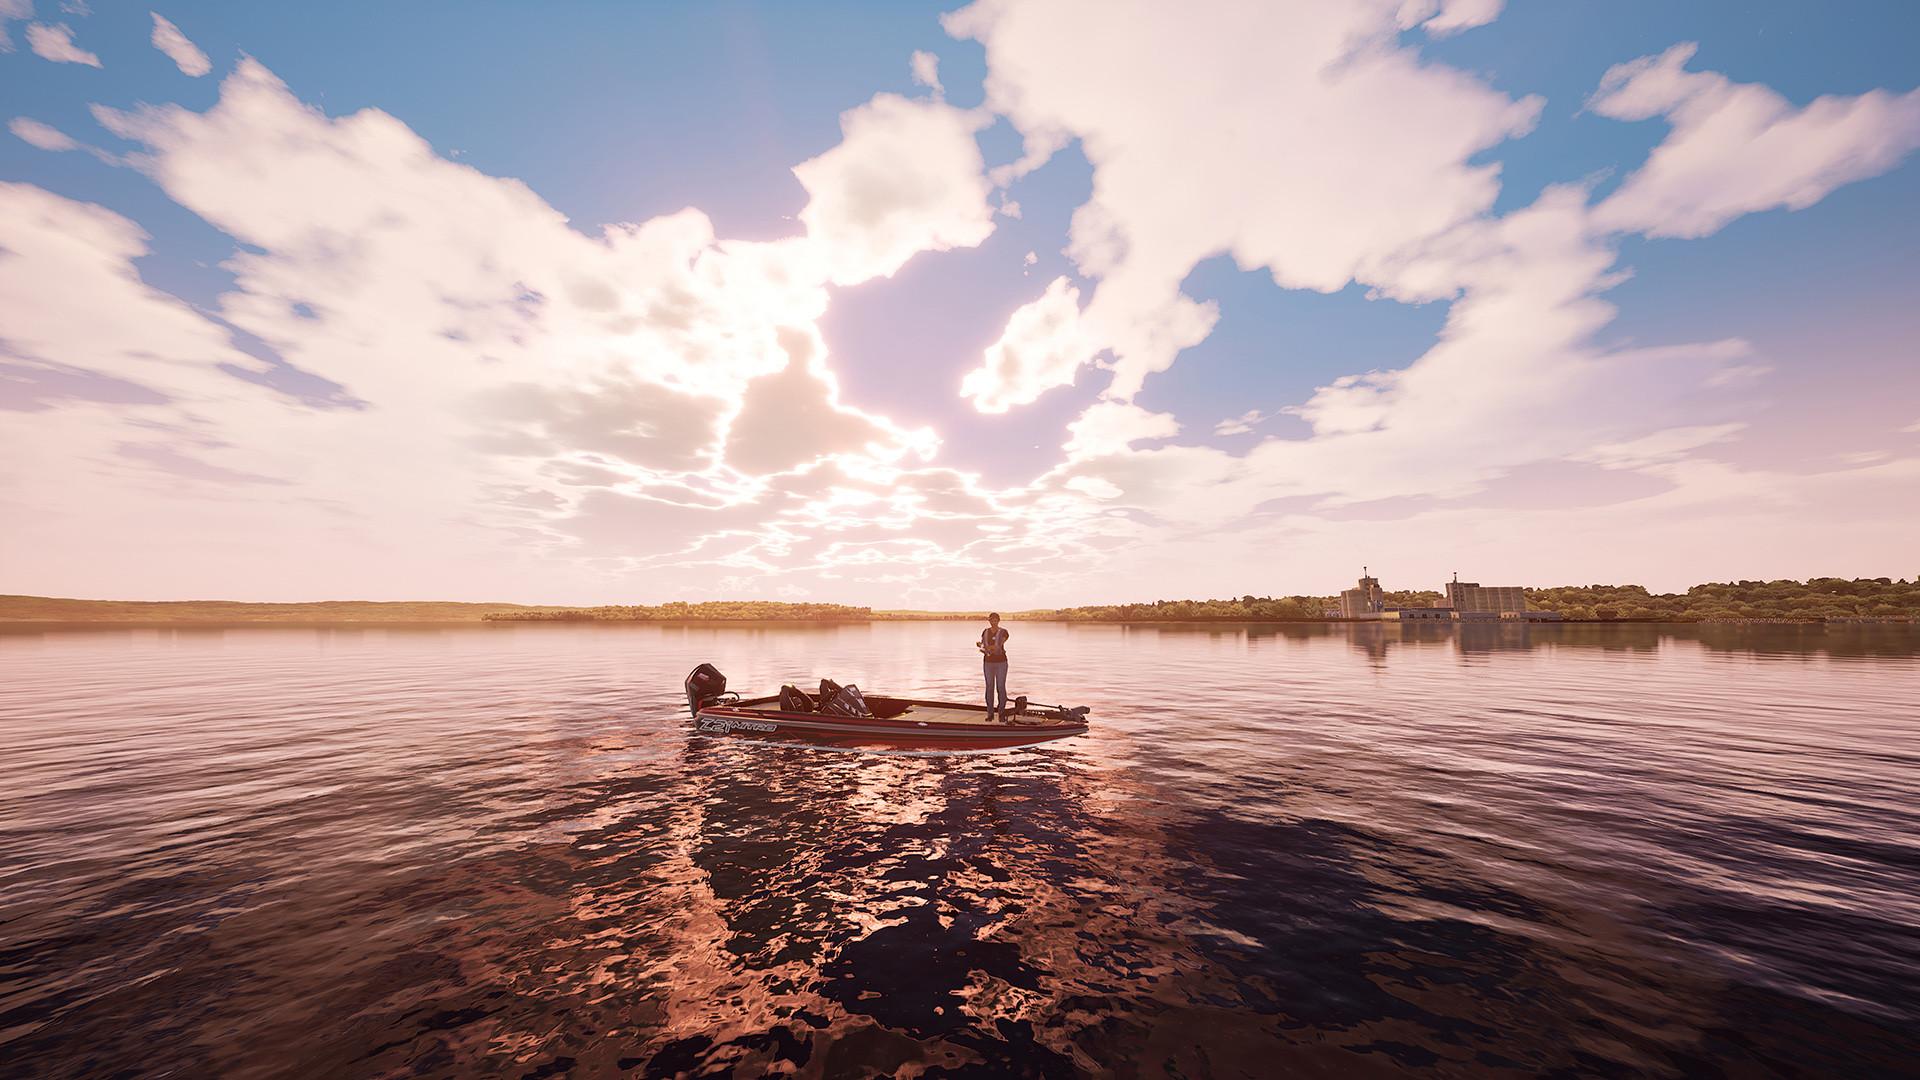 fishing-sim-world-bass-pro-shops-edition-pc-screenshot-02